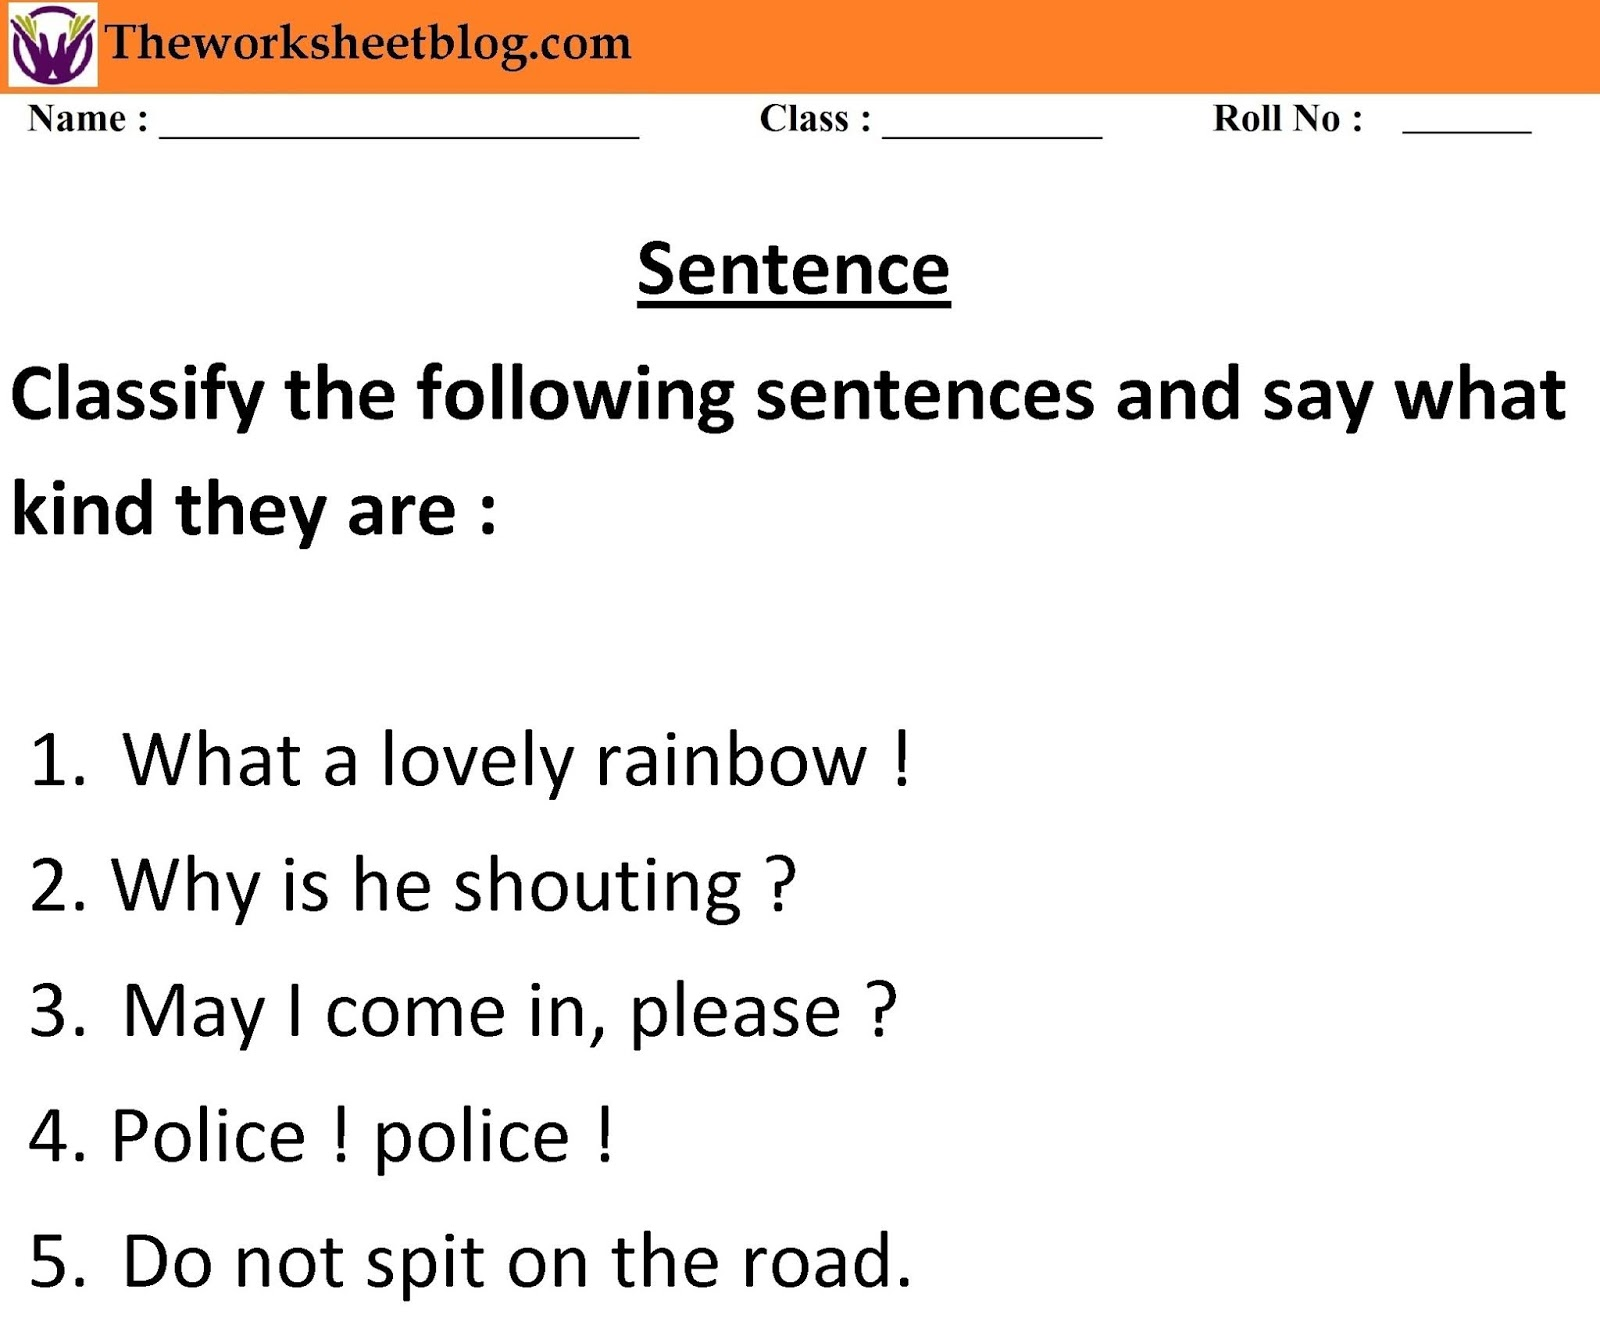 medium resolution of Sentence and kind of sentences worksheet. - Theworksheetsblog